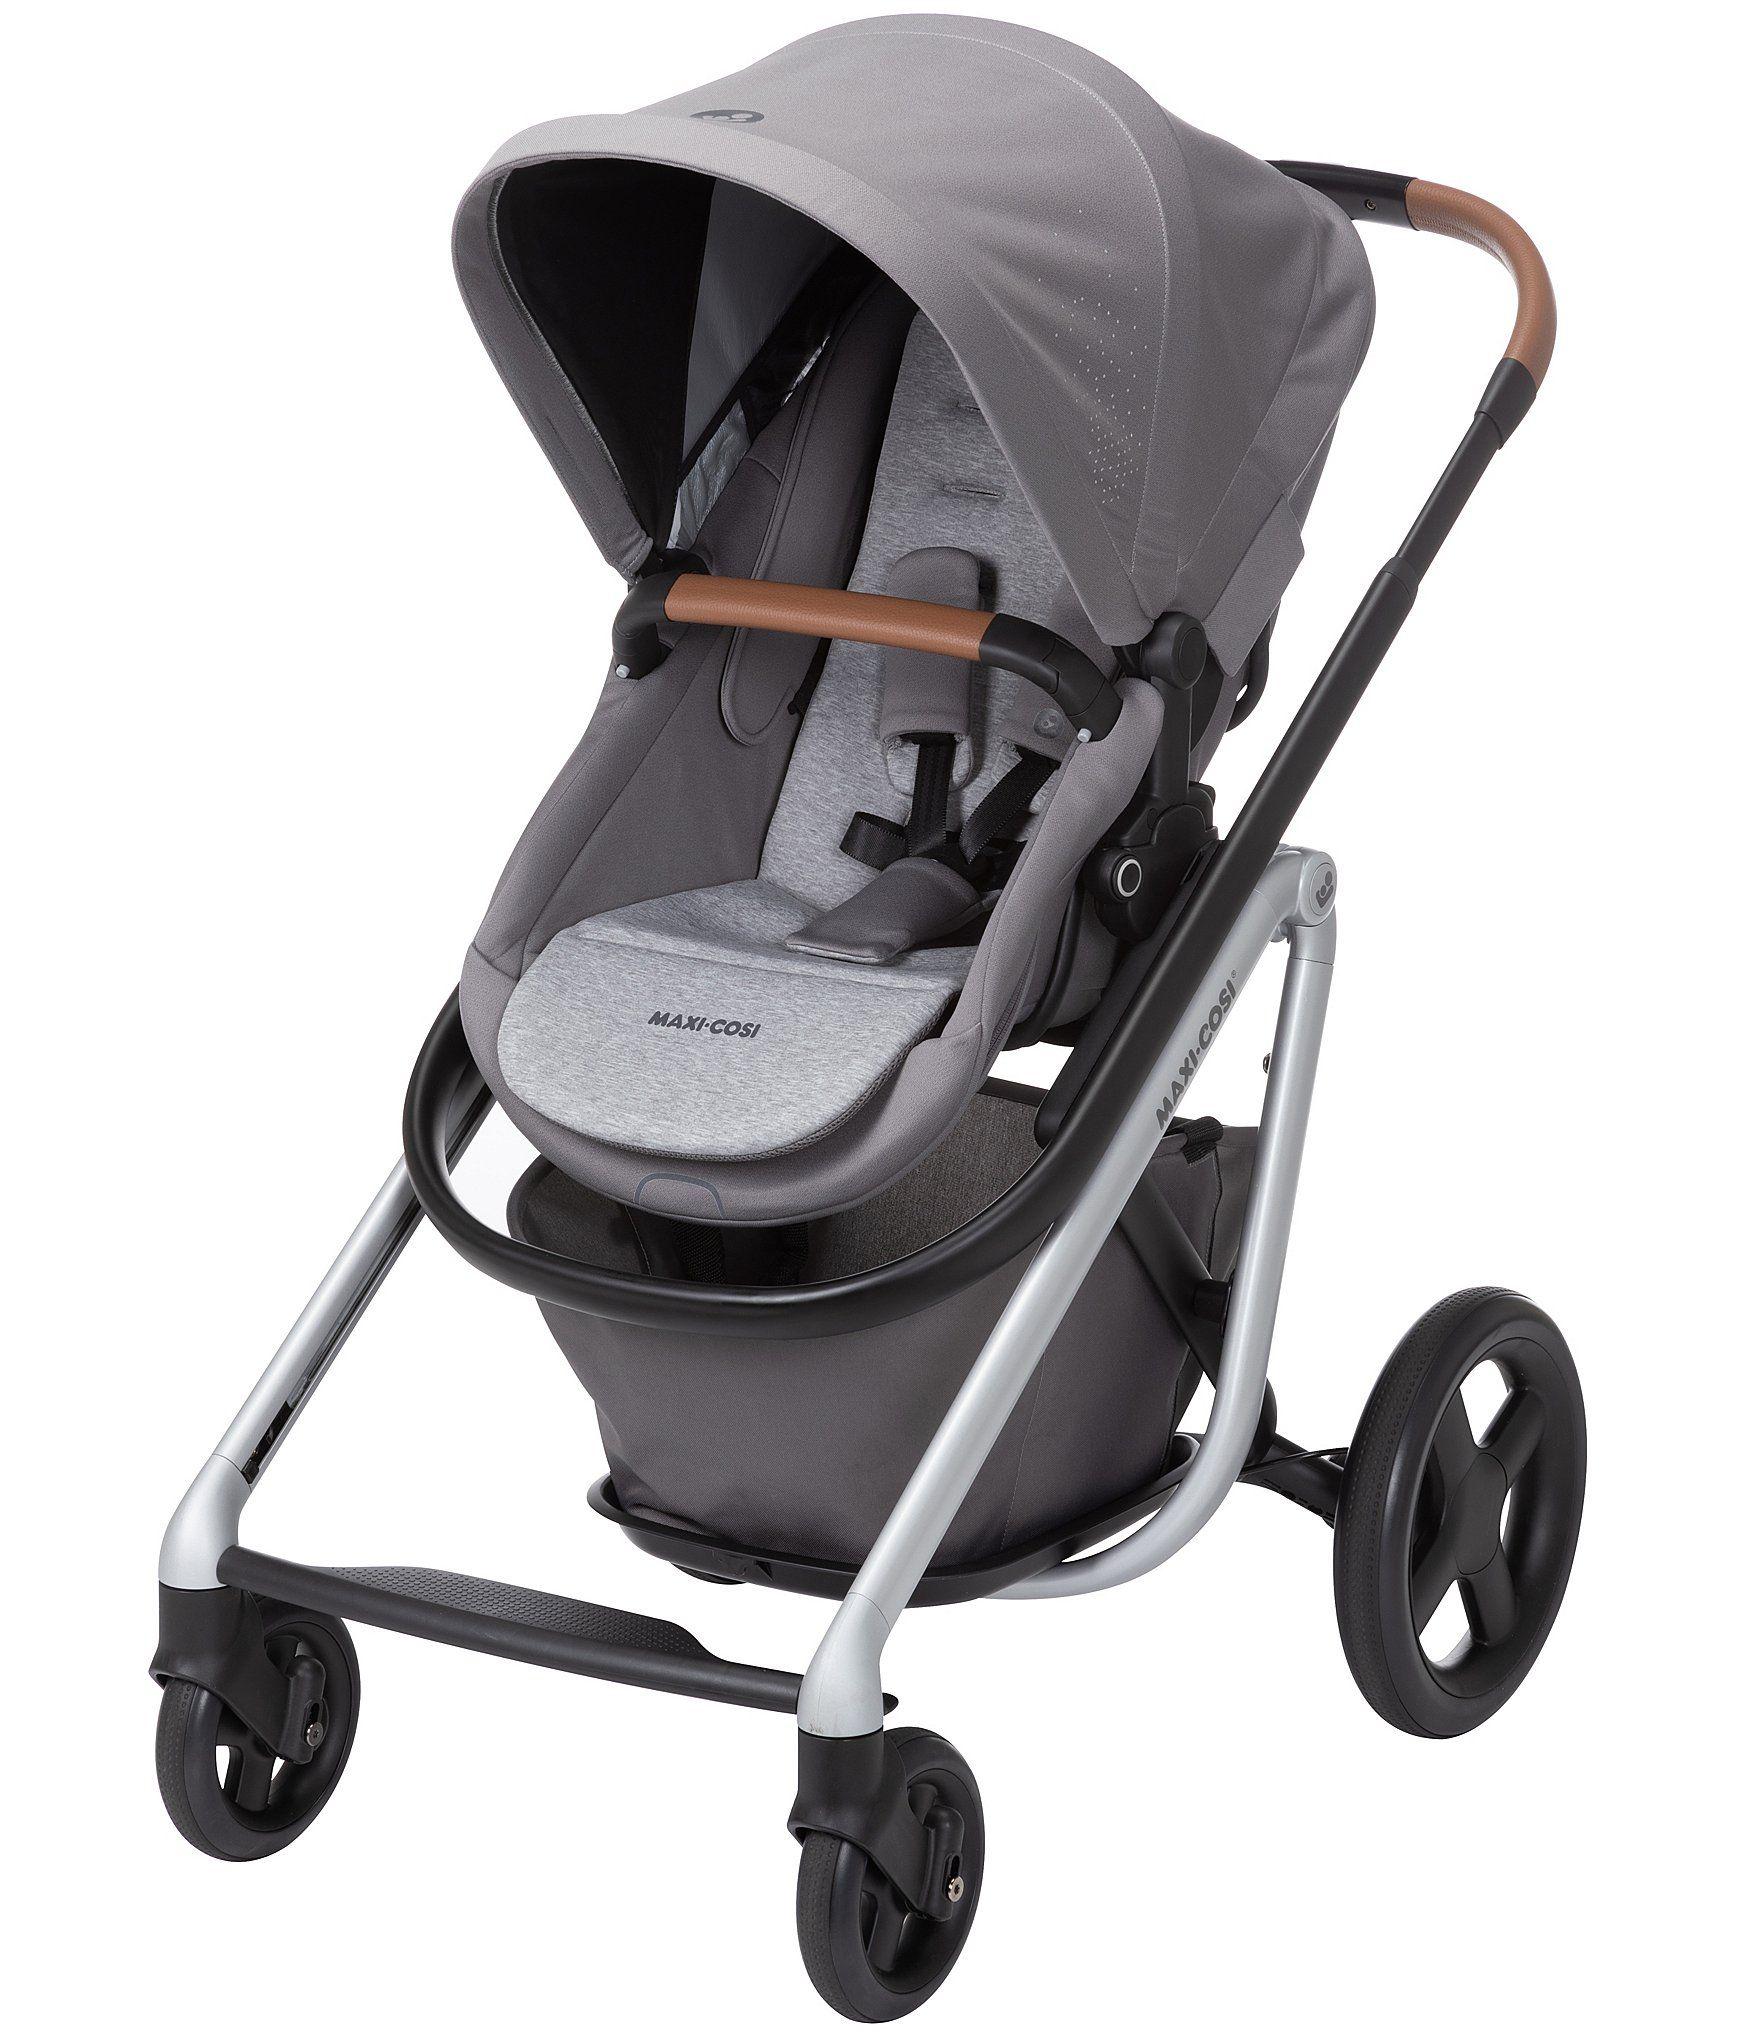 Maxi Cosi Lila™ Modular Stroller System Dillard's in